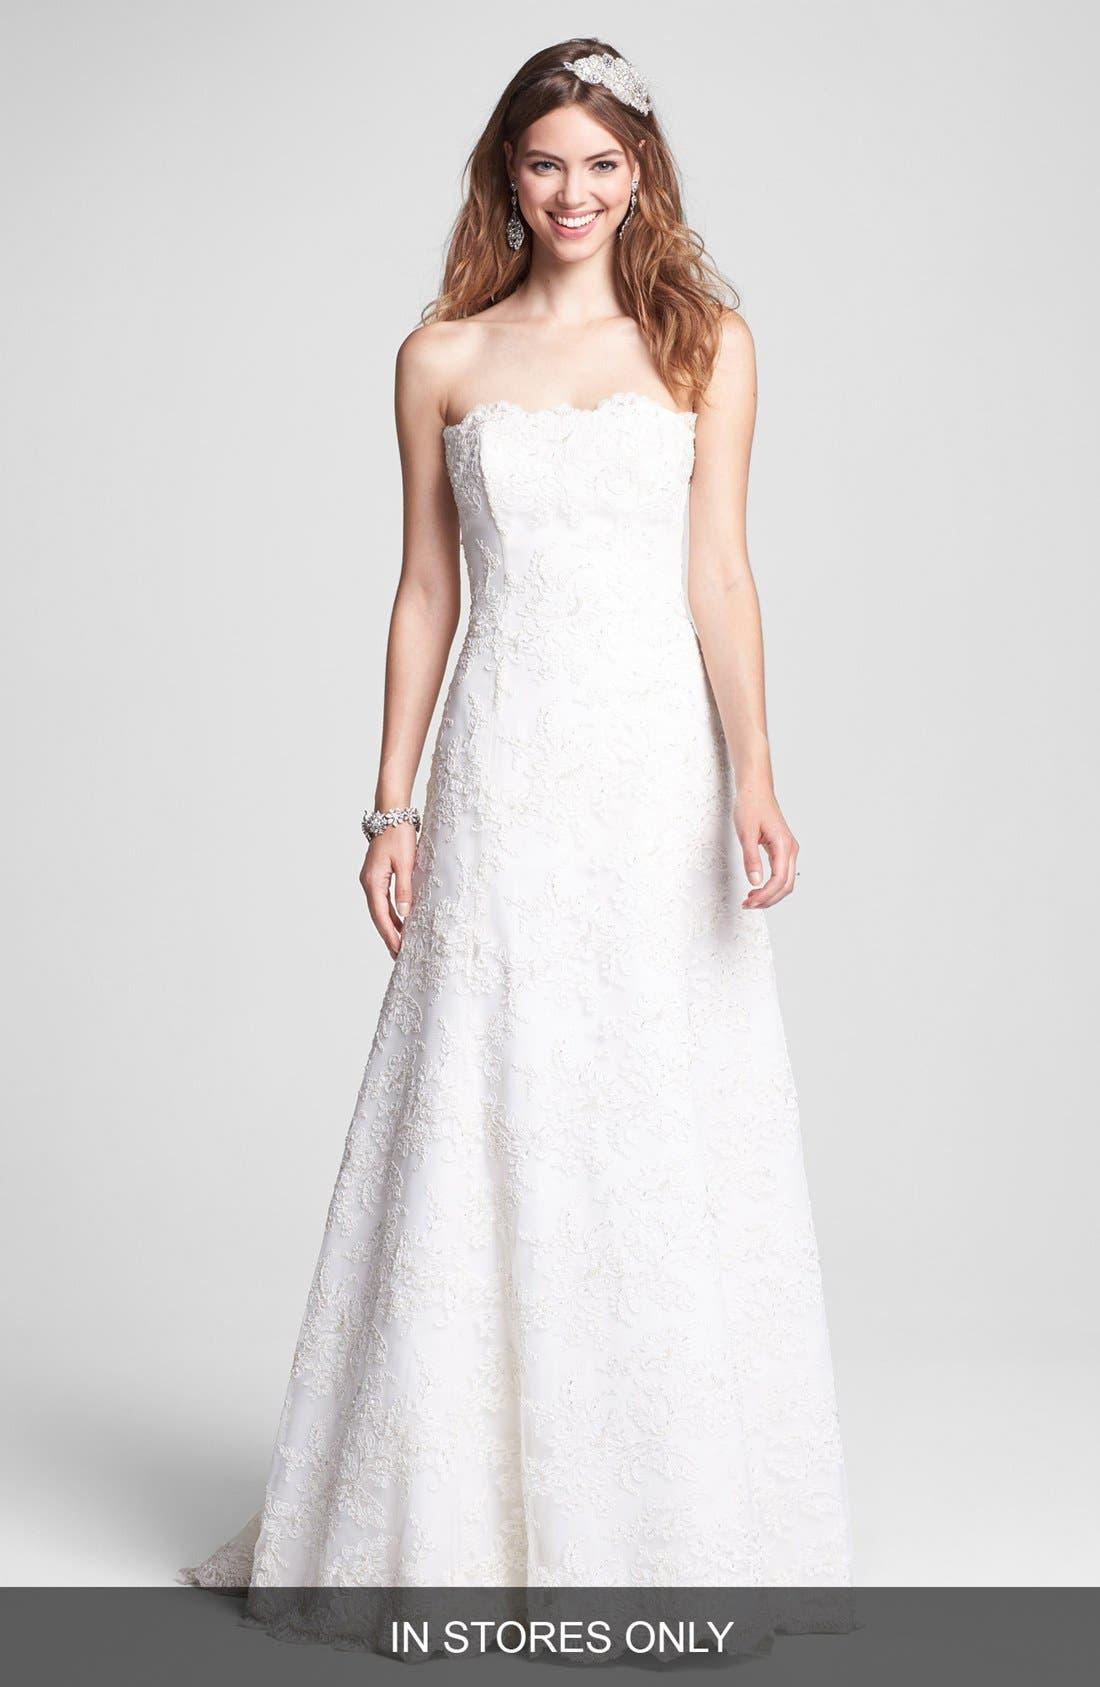 Main Image - BLISS Monique Lhuillier Strapless Beaded Lace Wedding Dress